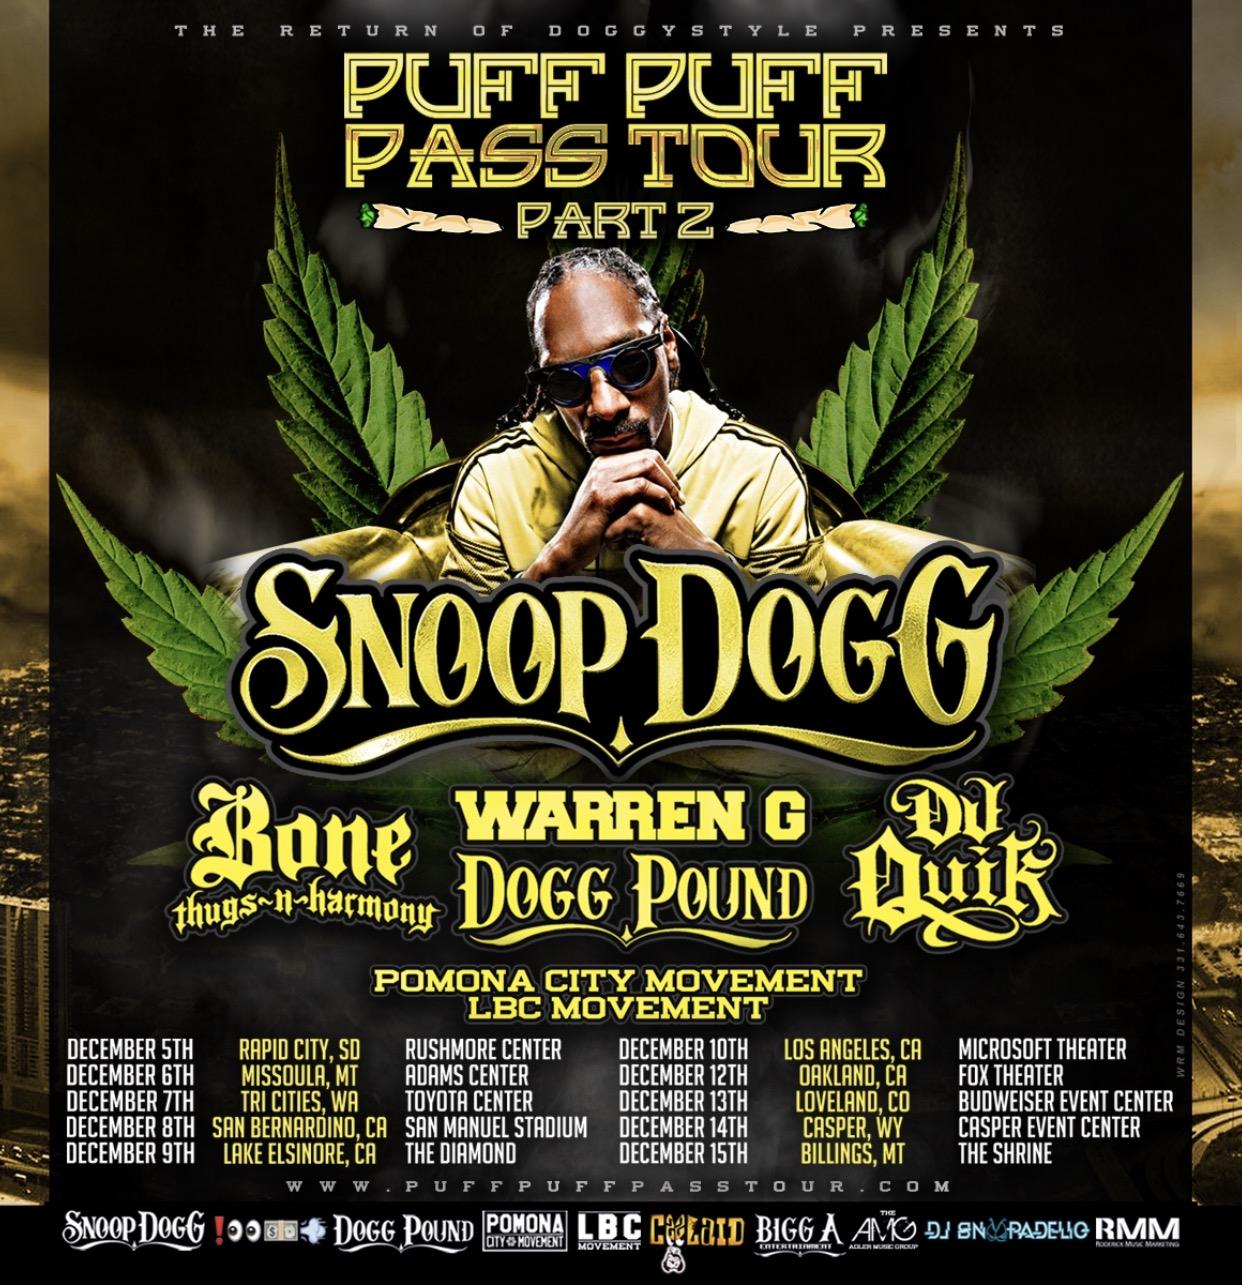 PUFF PUFF PASS TOUR 2